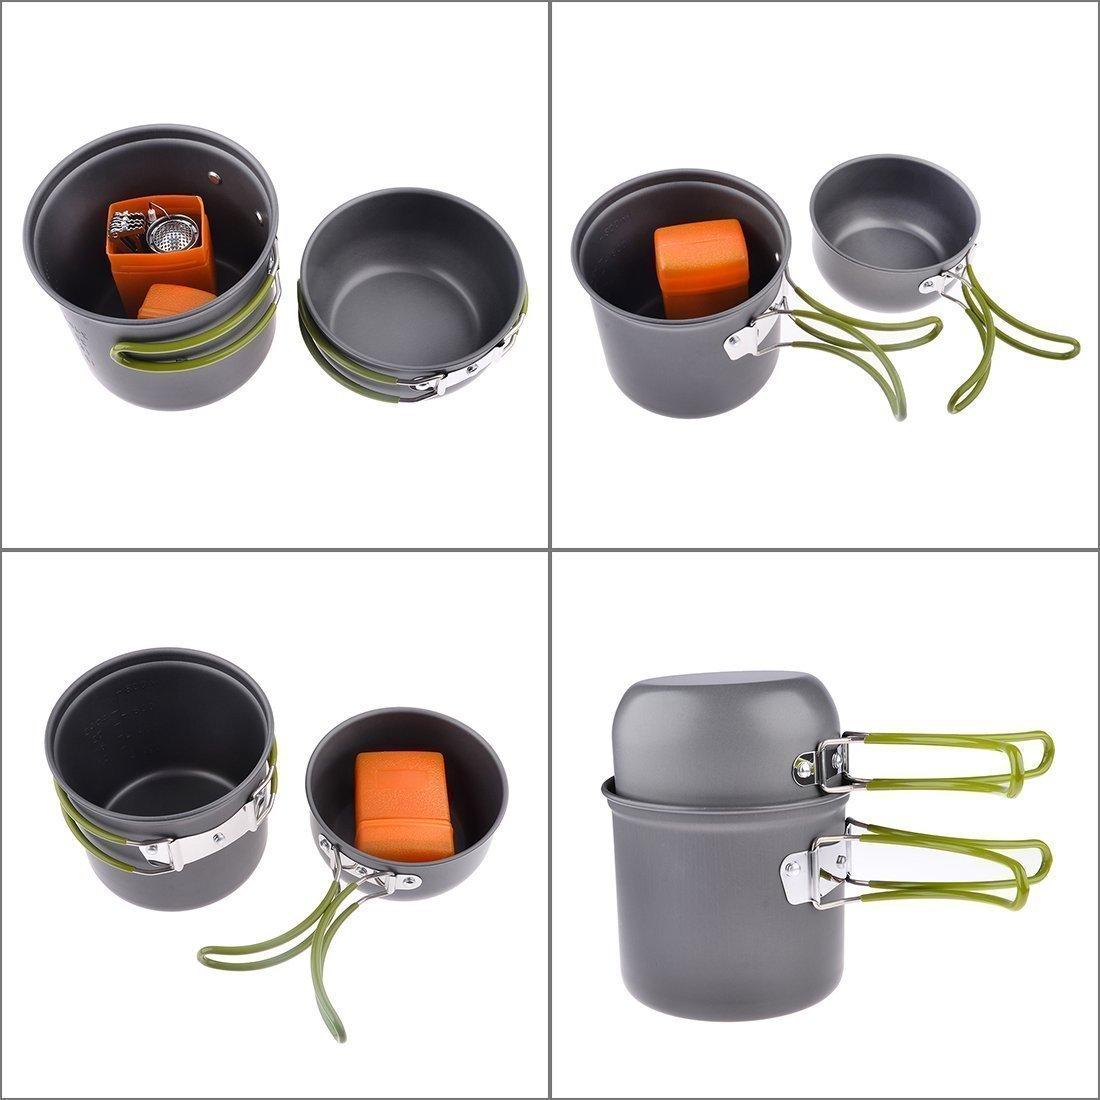 Amazon: Camp Stove AND Cookware Set $23.99 (Reg. $39.99)